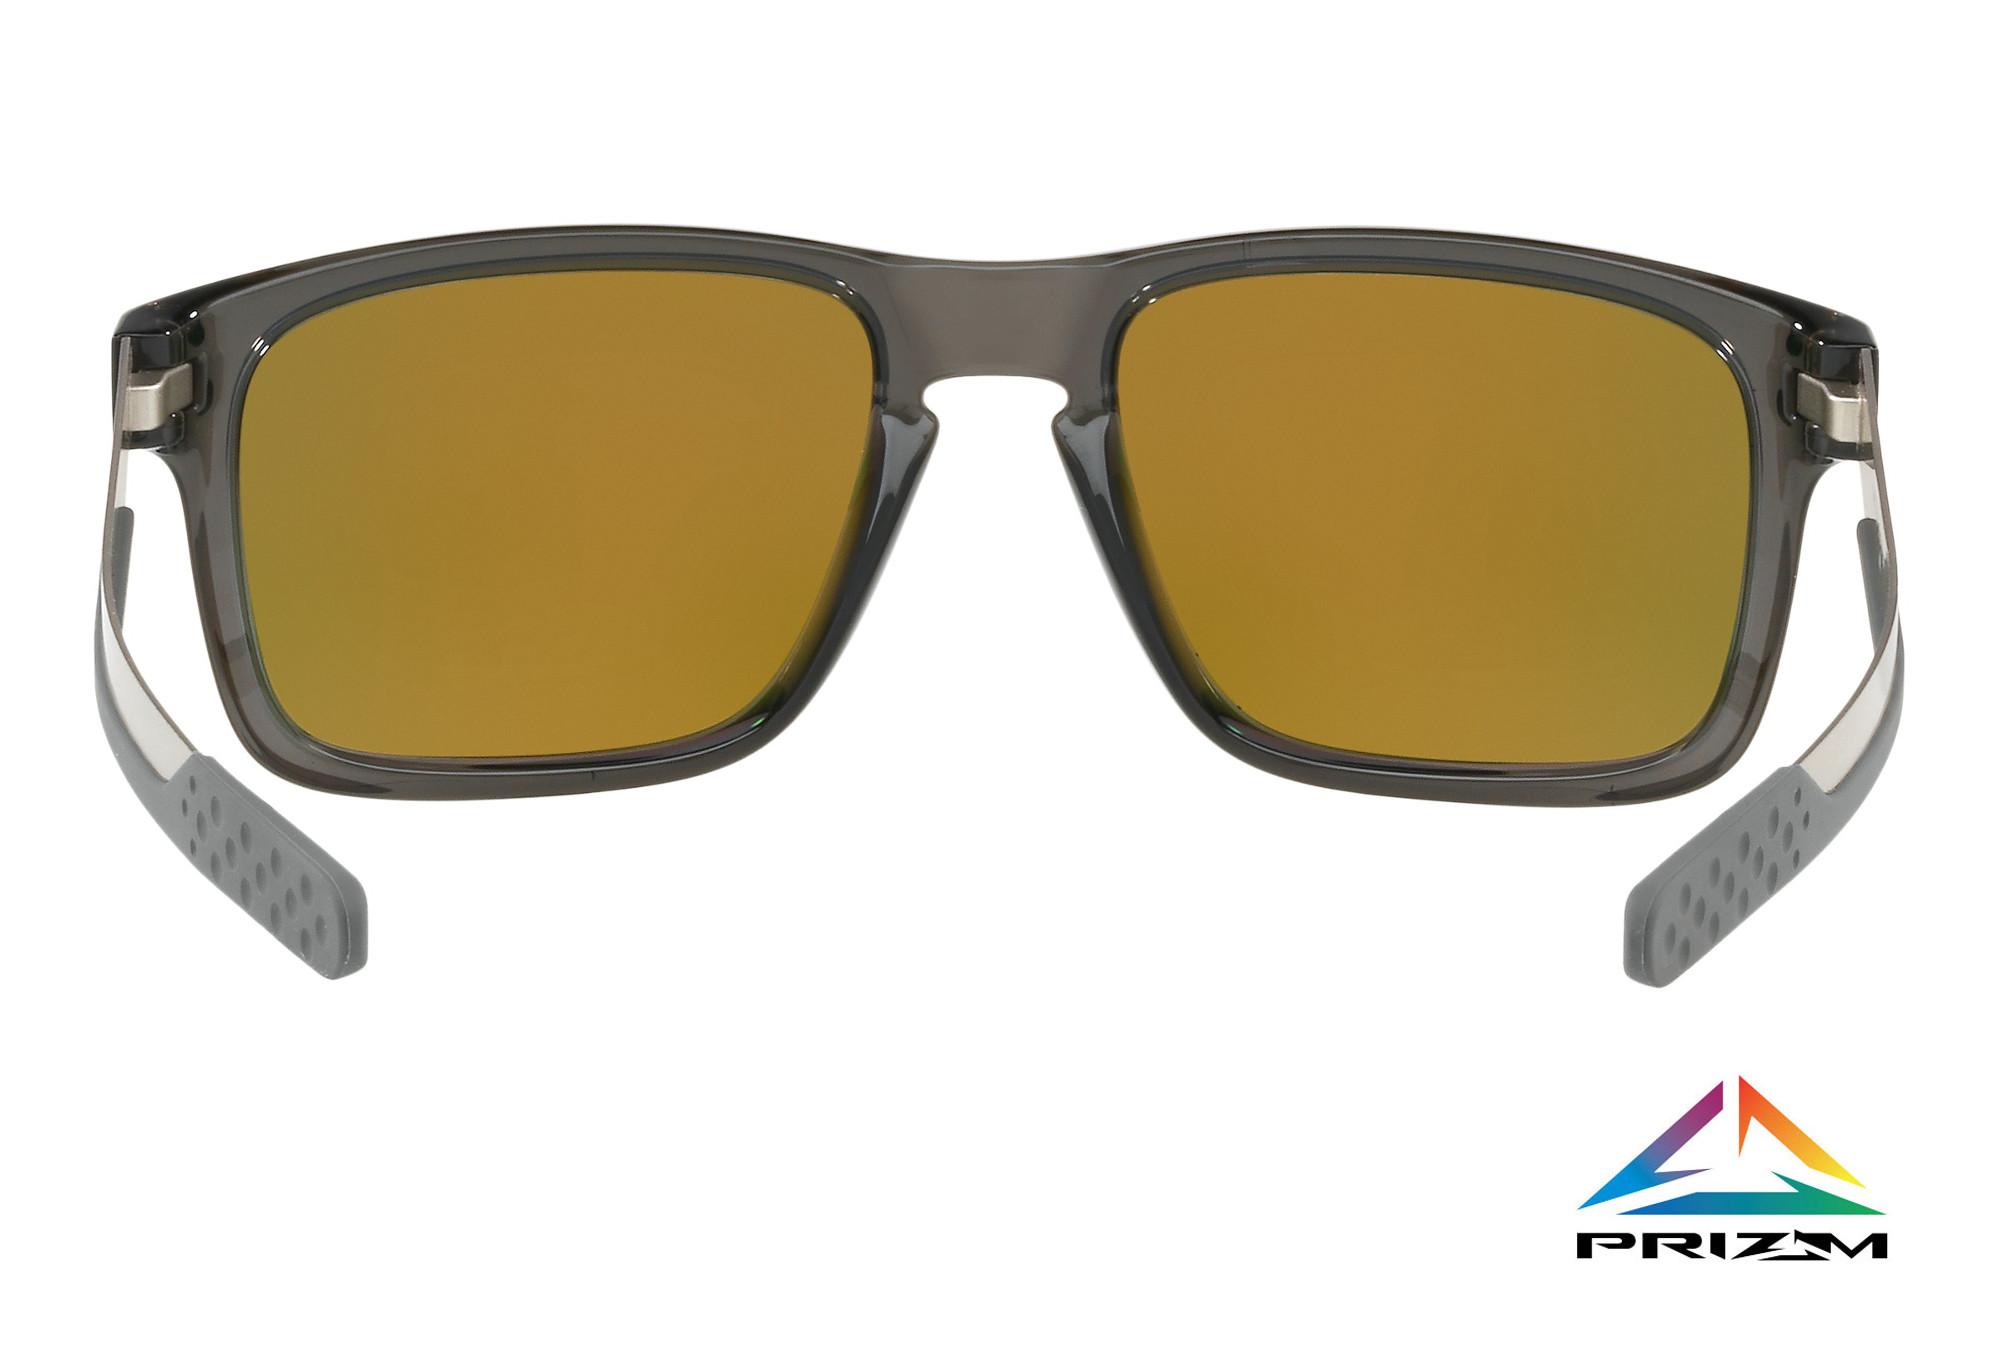 145e4182ce OAKLEY Sunglasses Holbrook Mix Grey Smoke Prizm Ruby Polarized Ref   OO9384-0757